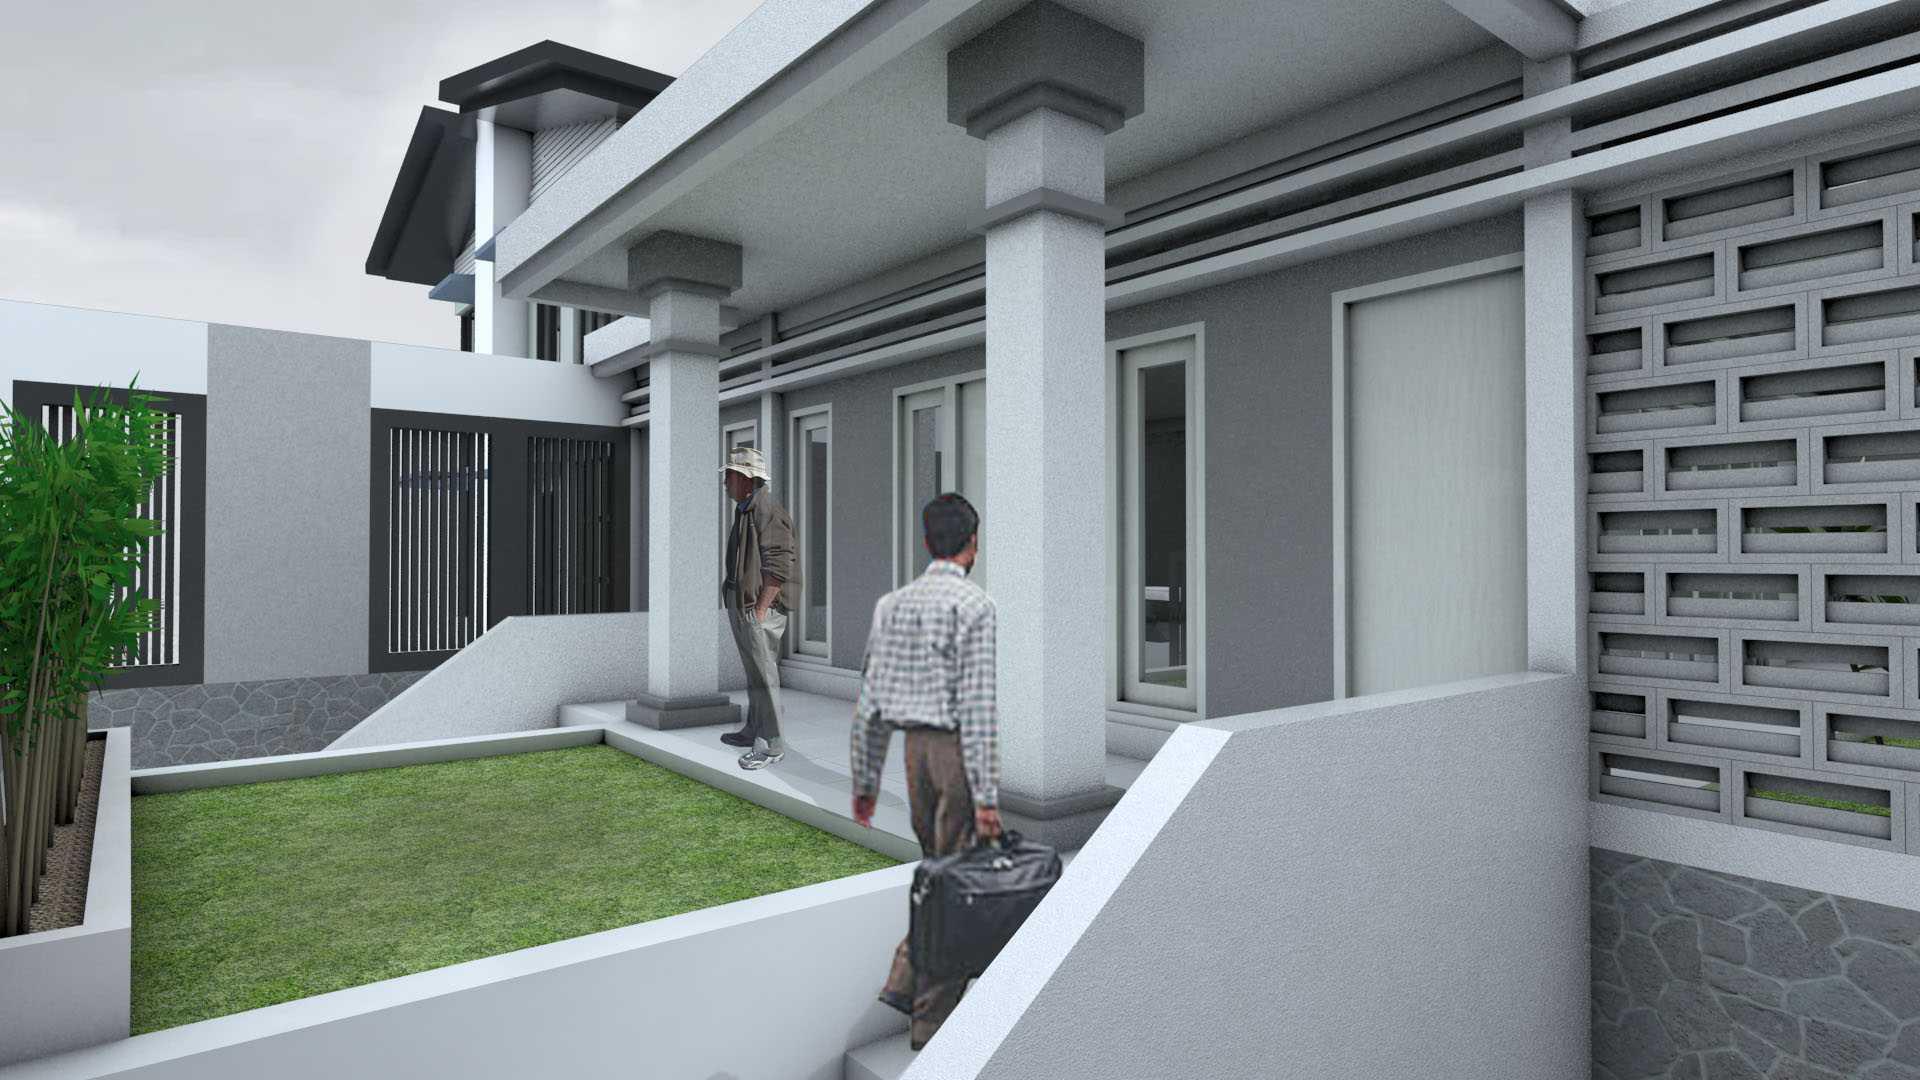 Nawabha Renovasi Rumah Cimahi Cimahi, Bandung Cimahi, Bandung Perspektif-3   25387